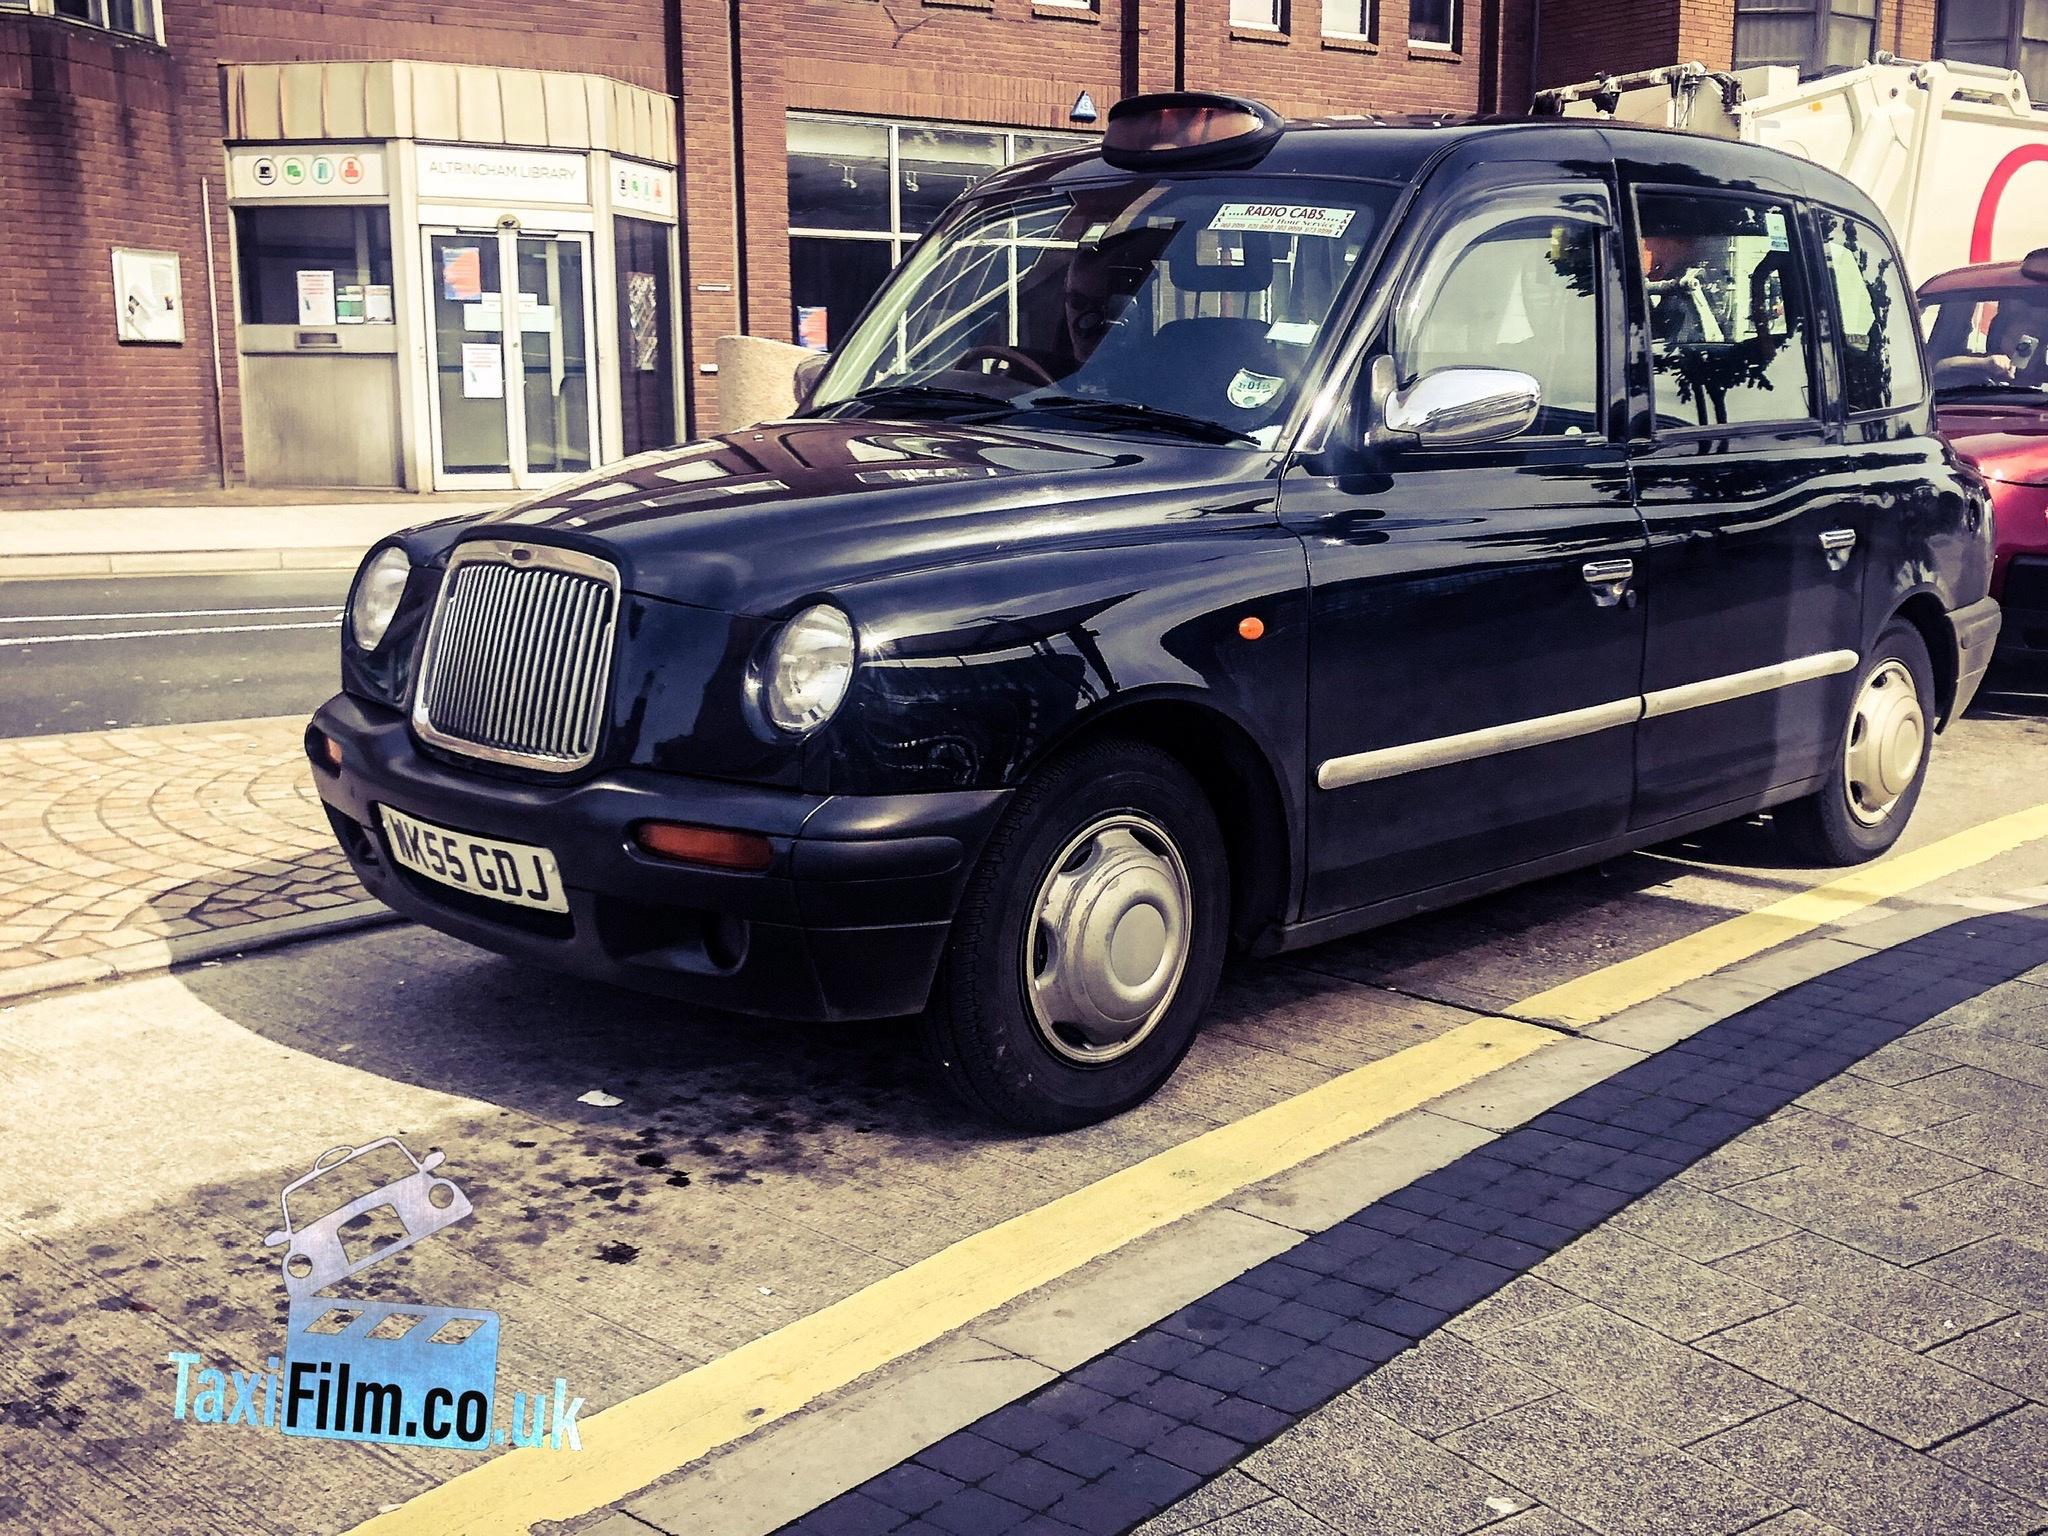 Black Tx2 taxi prop vehicle action film